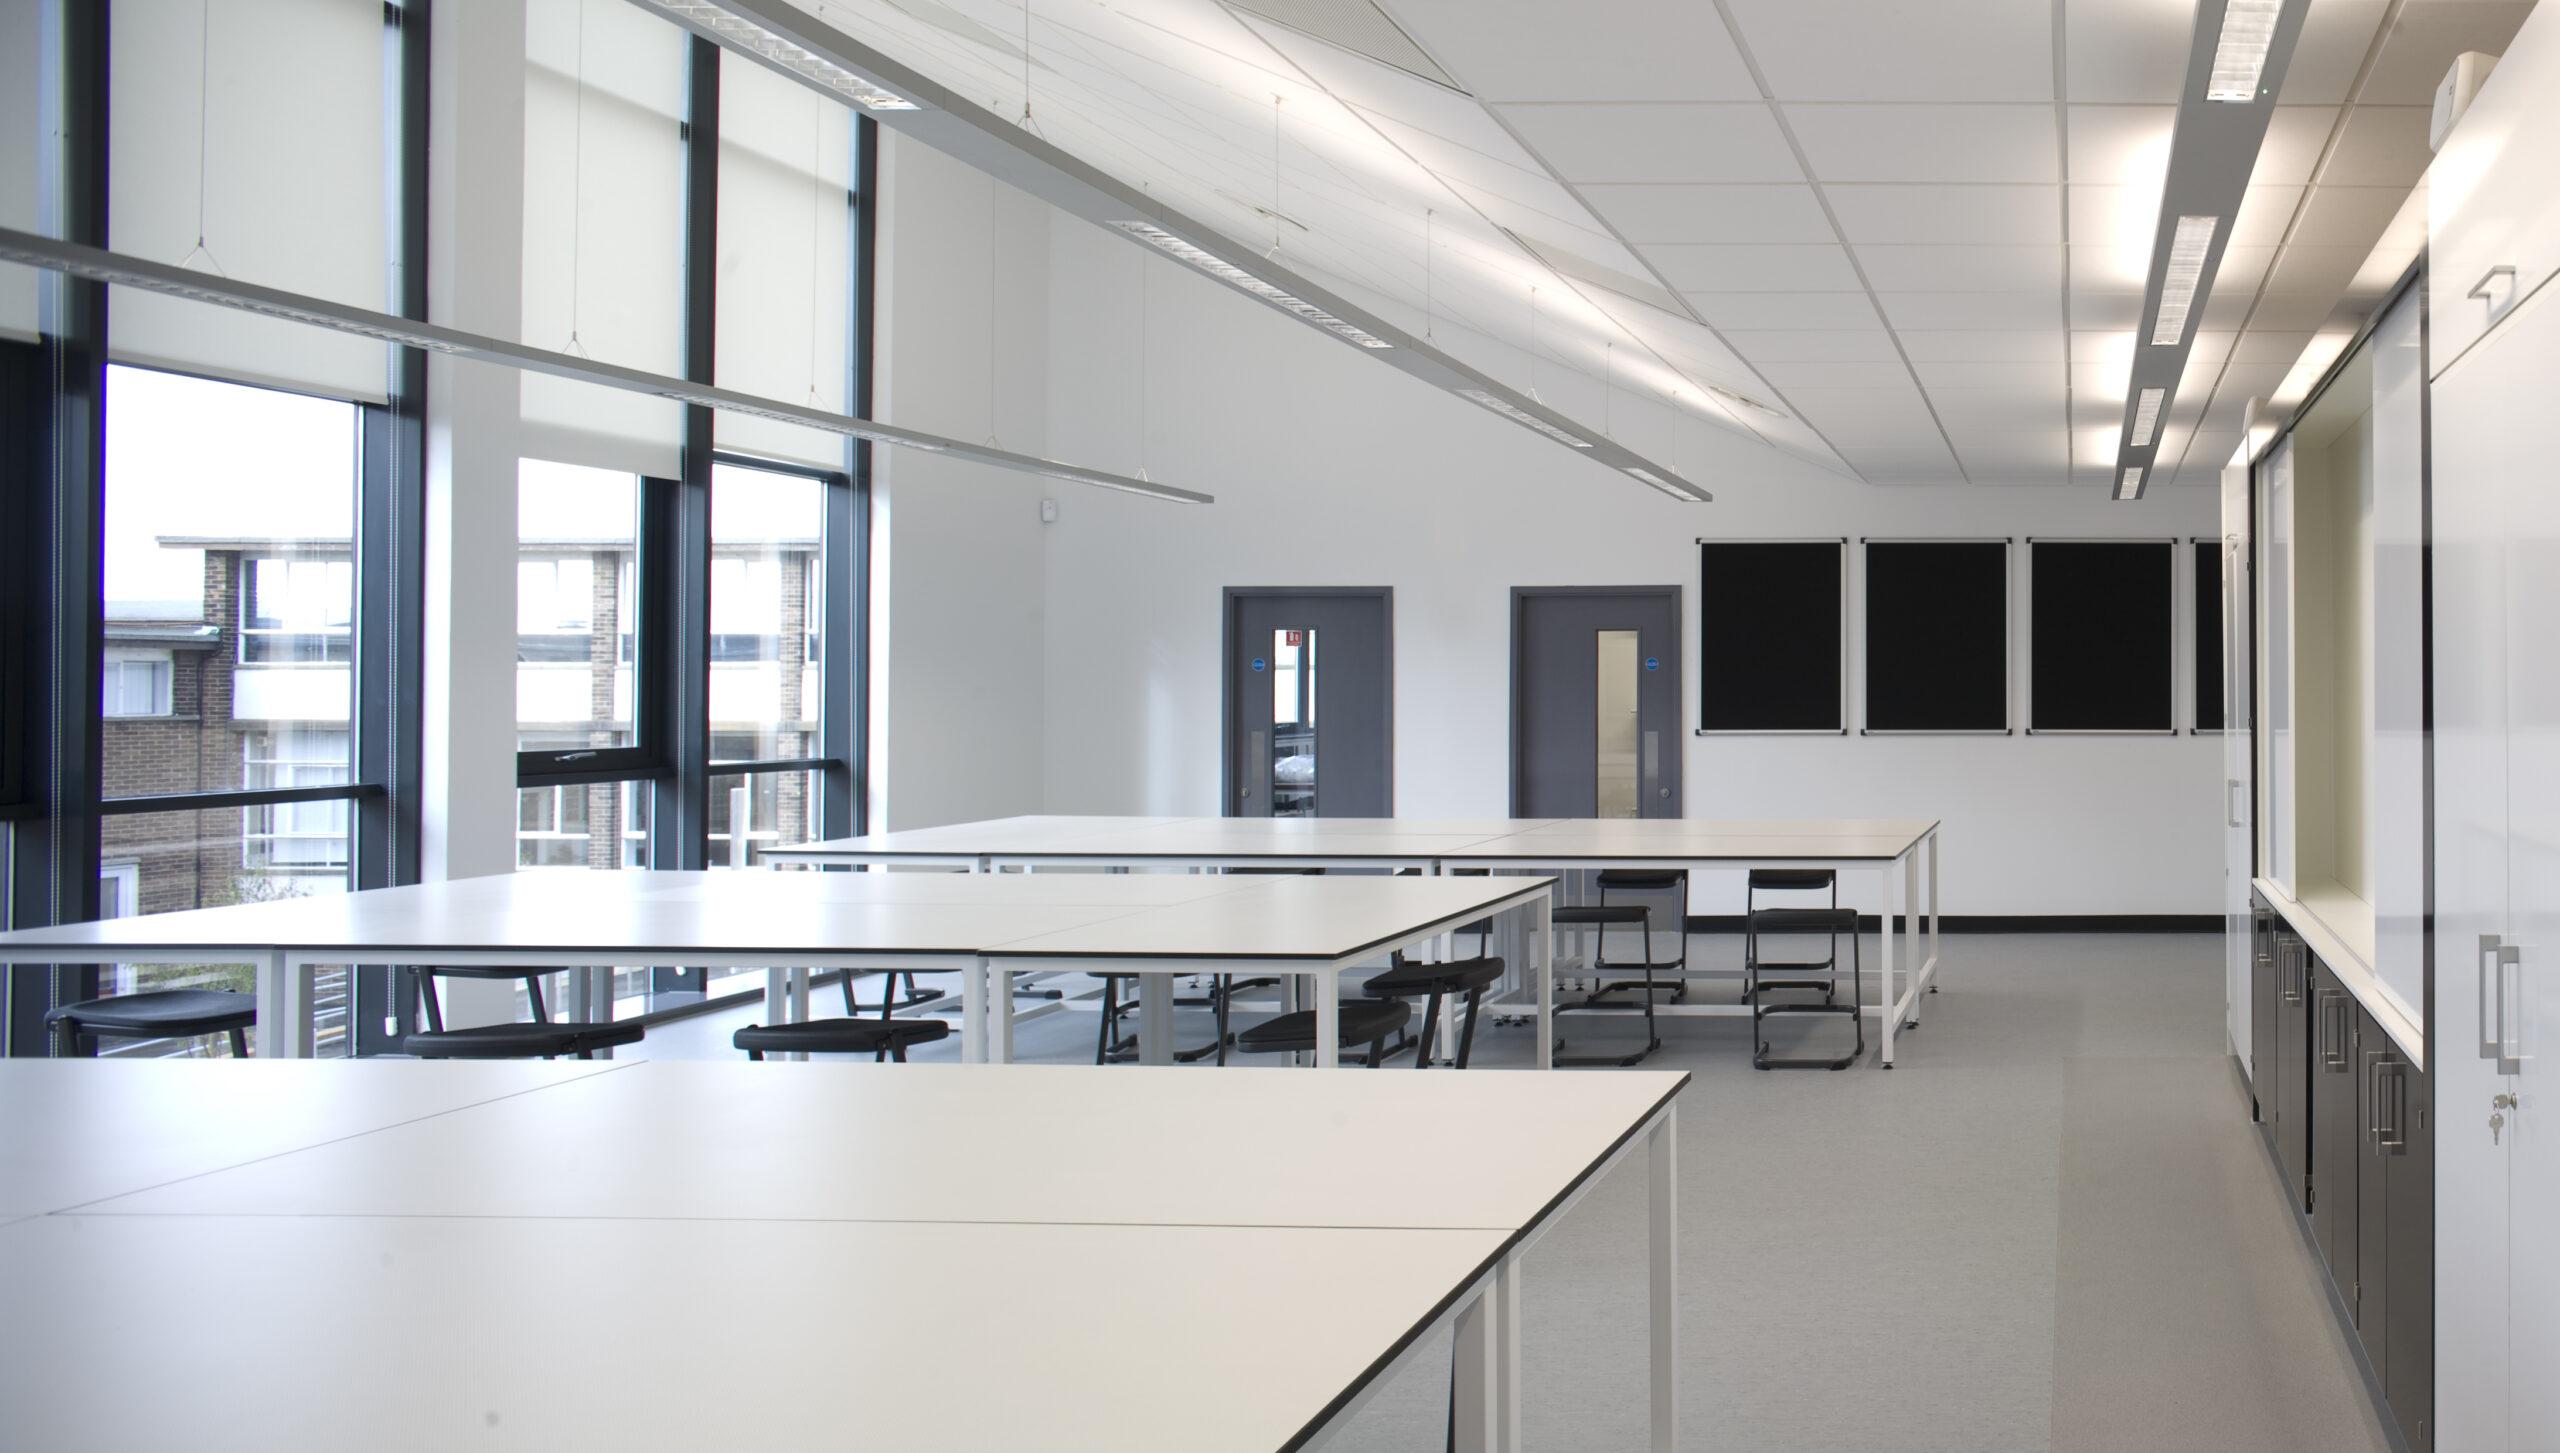 lighting education